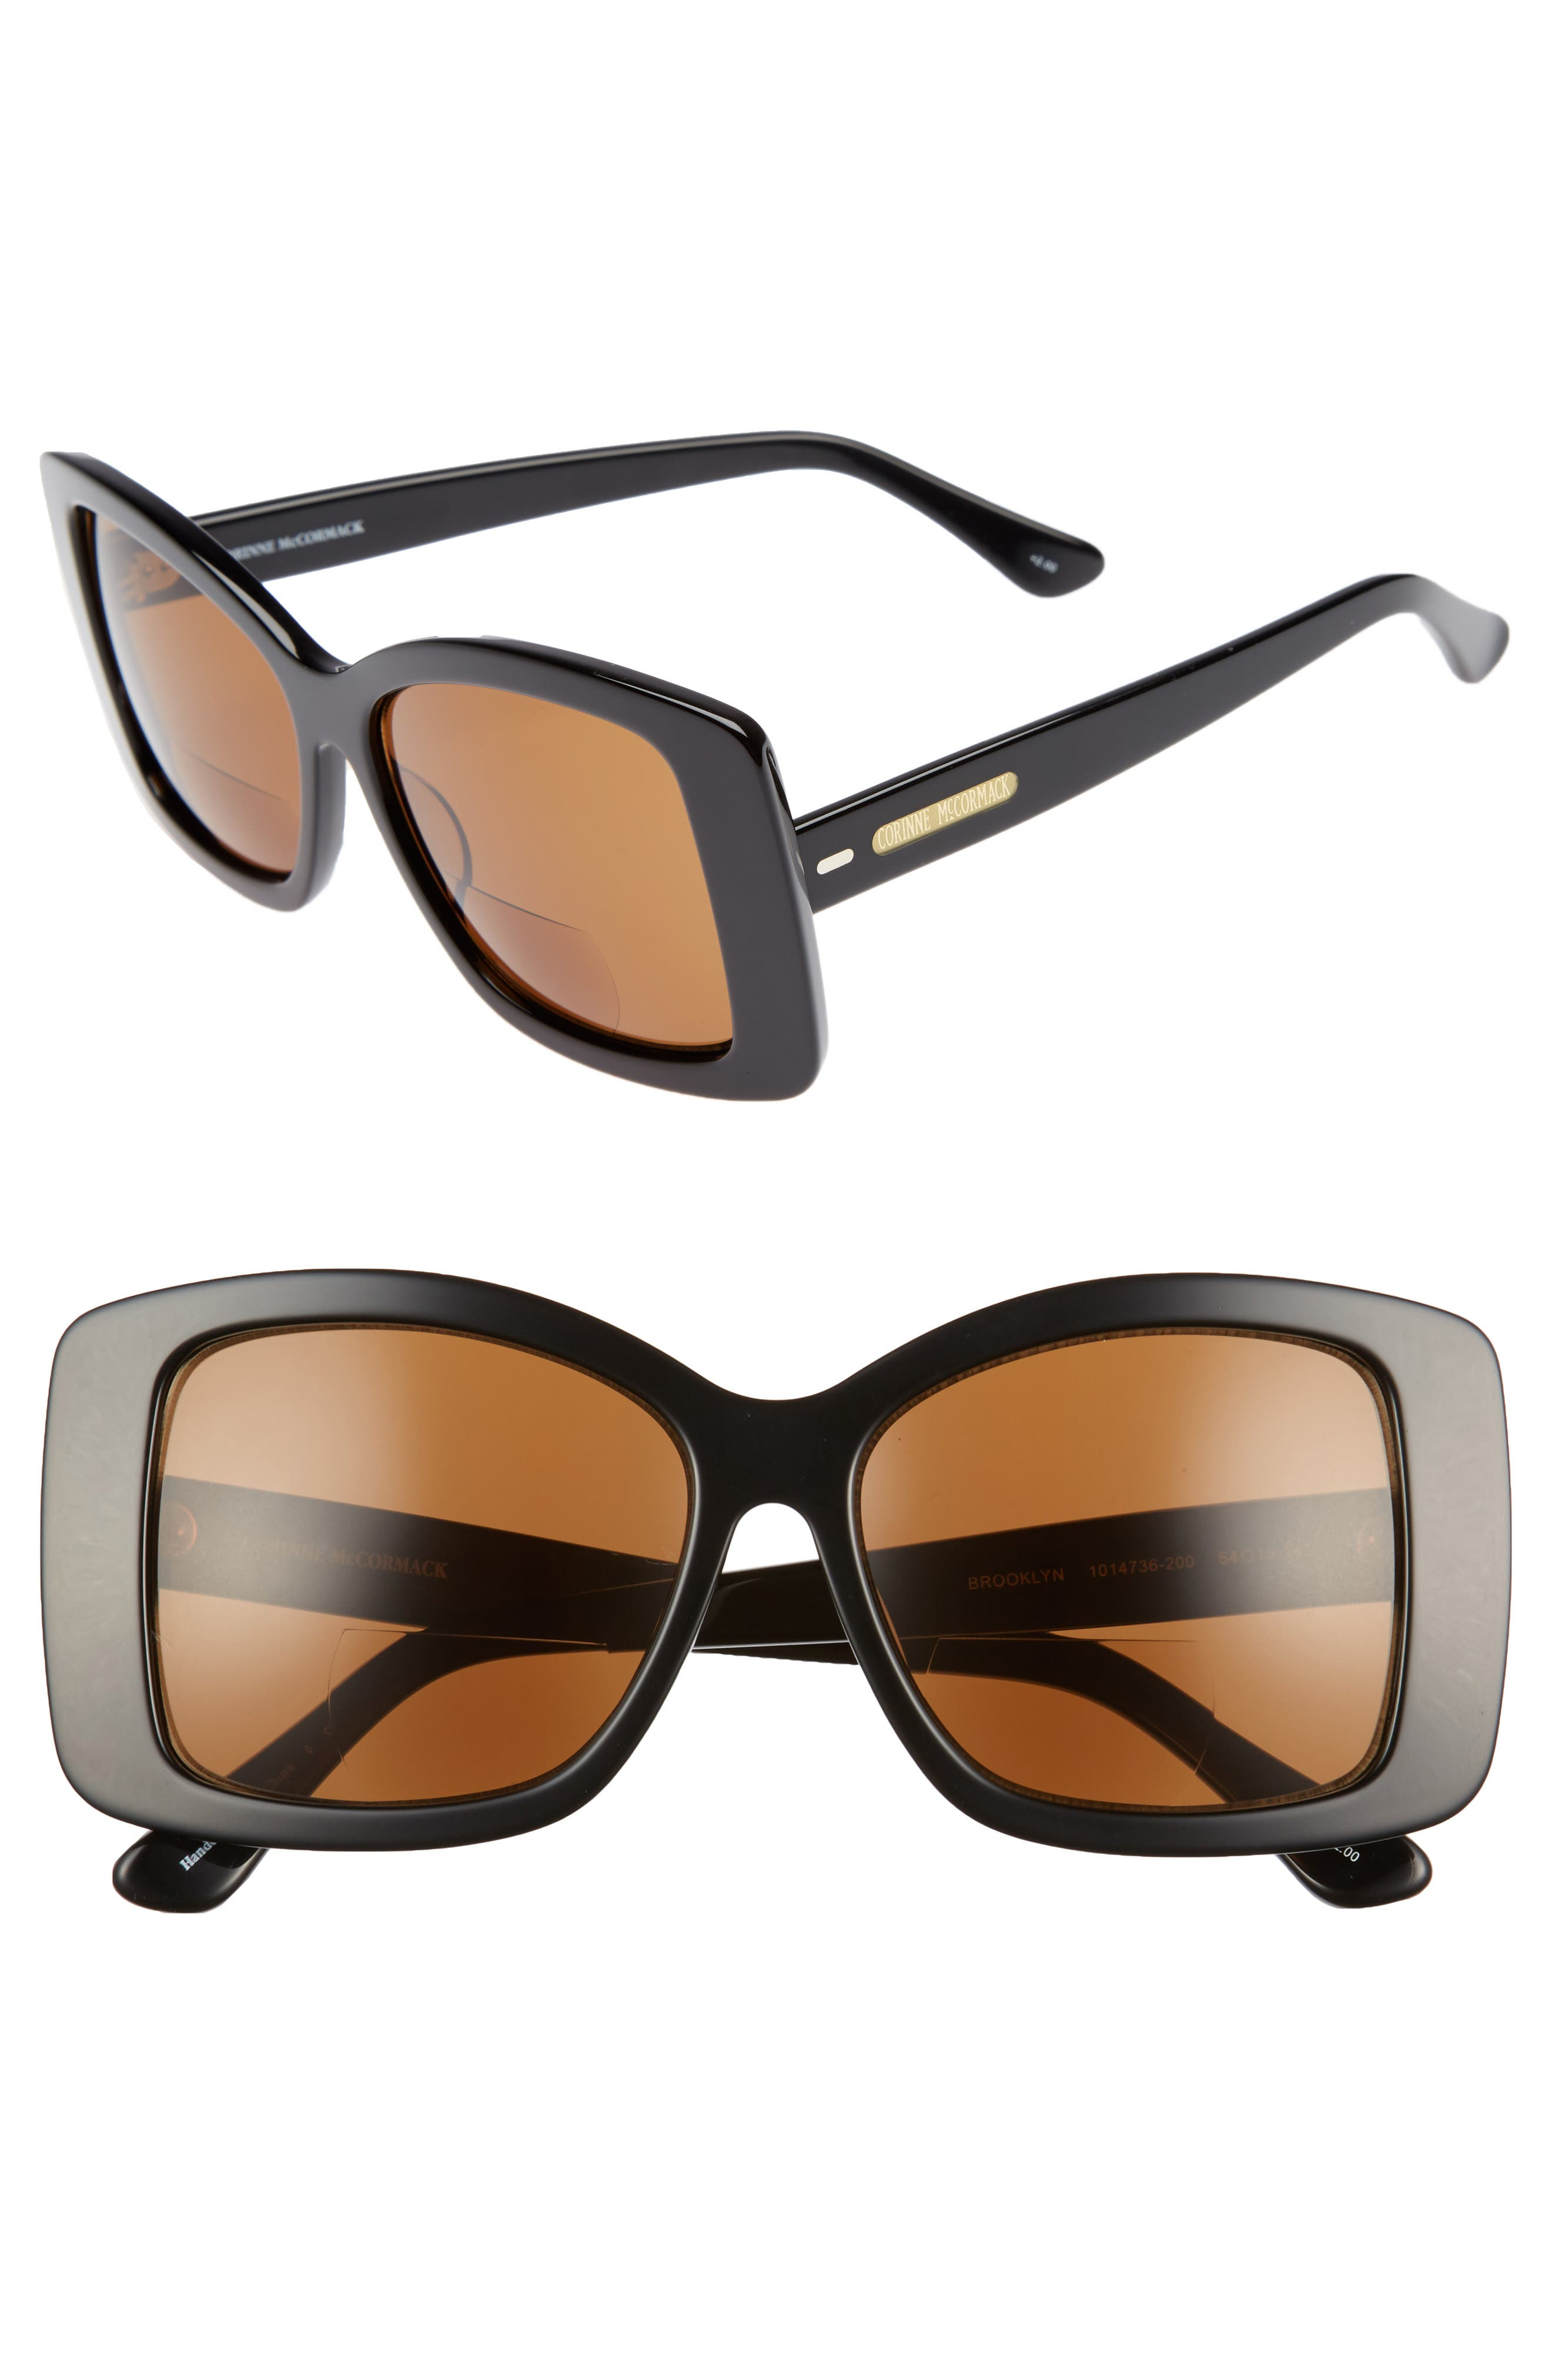 Brooklyn 54mm Reading Sunglasses,                         Main,                         color, 001